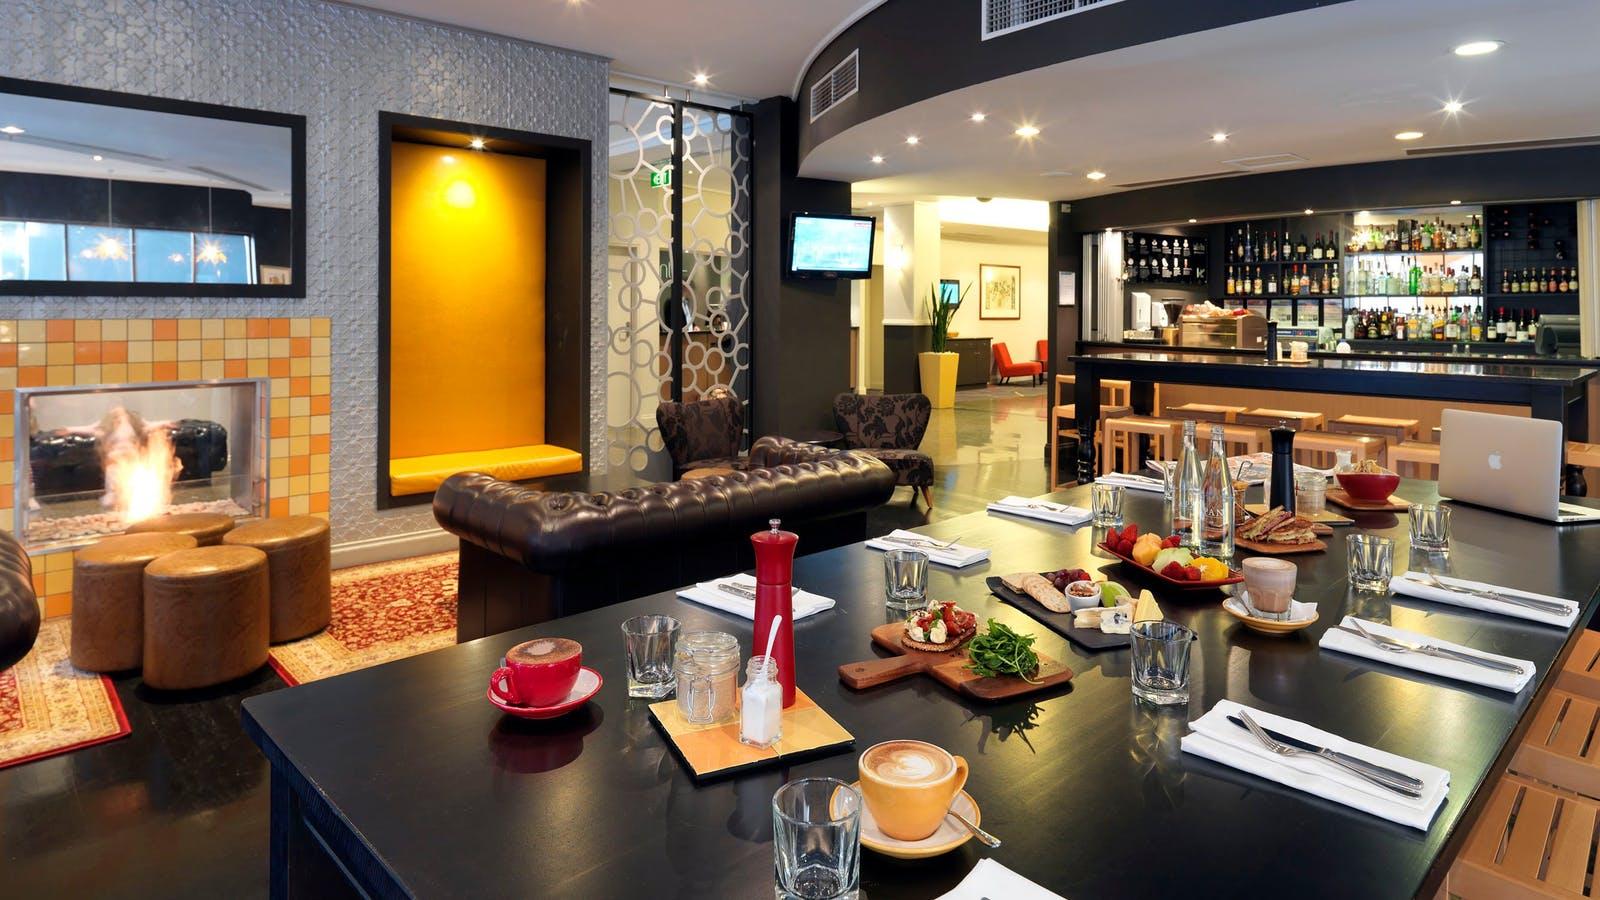 Alibi Kitchen & Bar